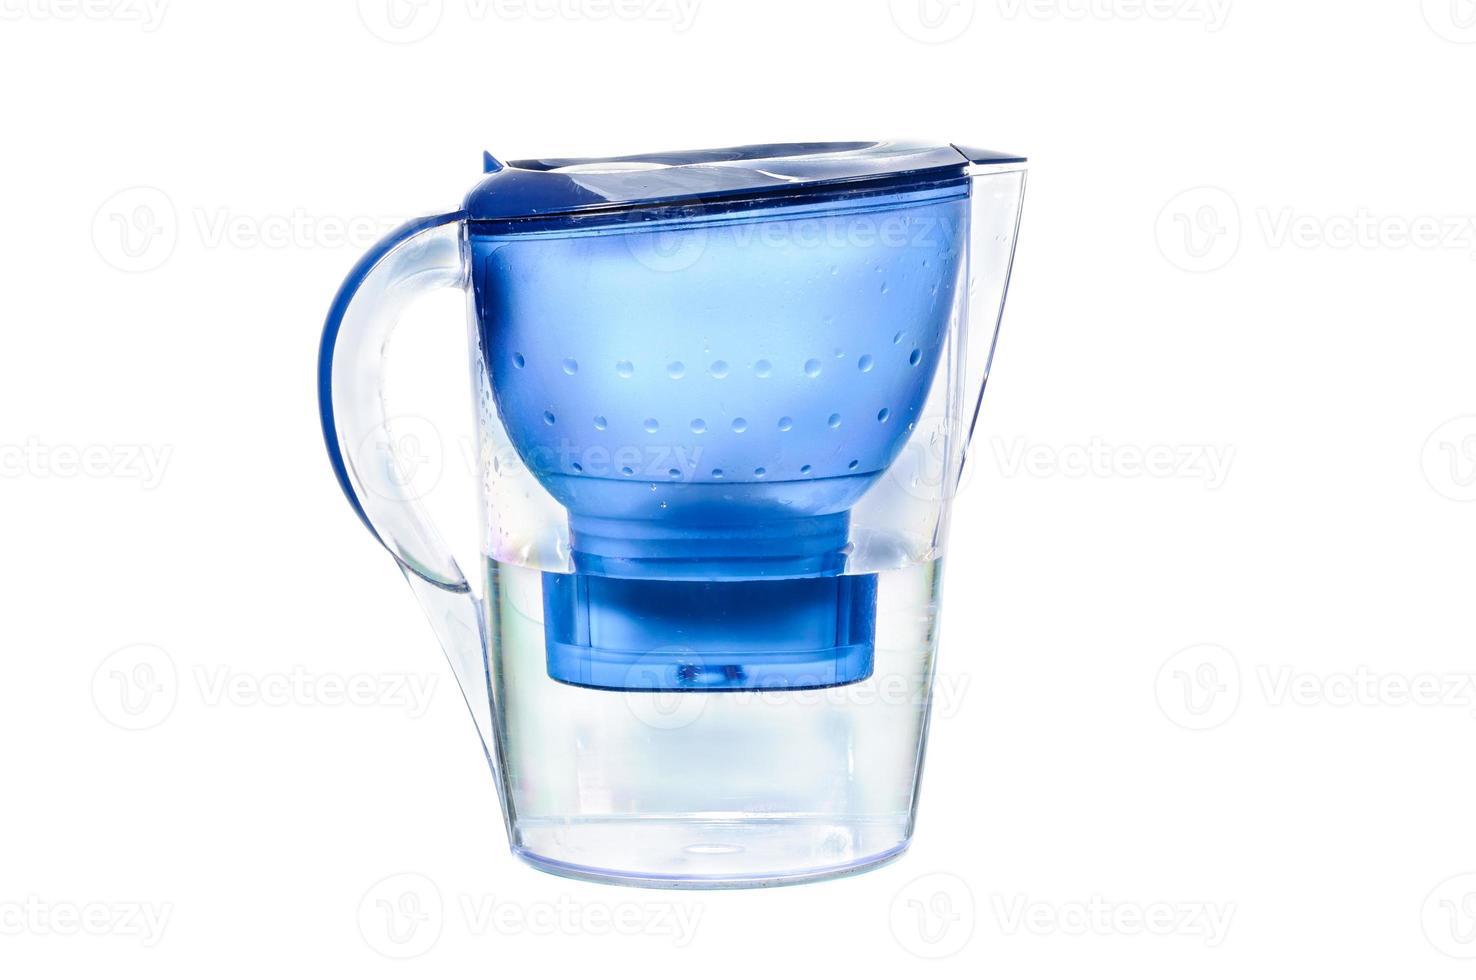 água filtrada fresca para beber foto